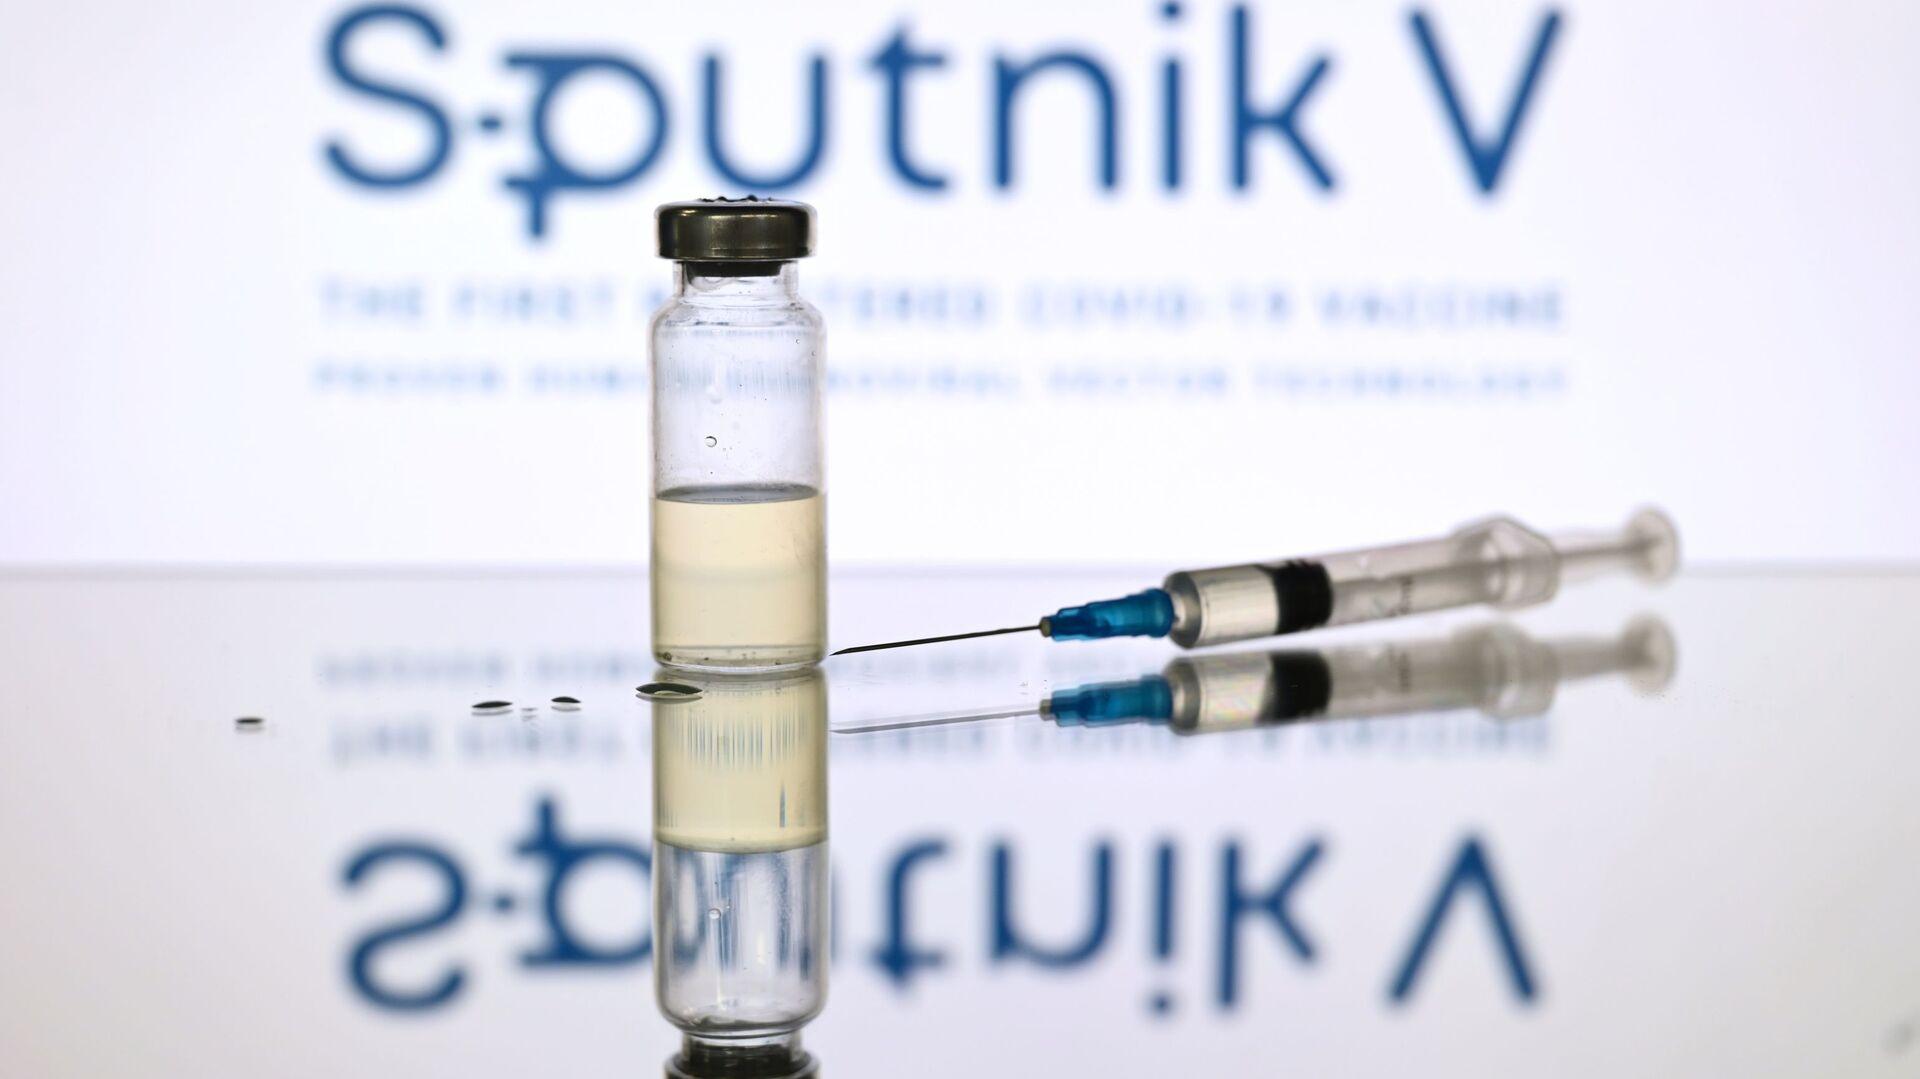 Vakcina protiv kovida Sputnjik Ve - Sputnik Srbija, 1920, 24.02.2021